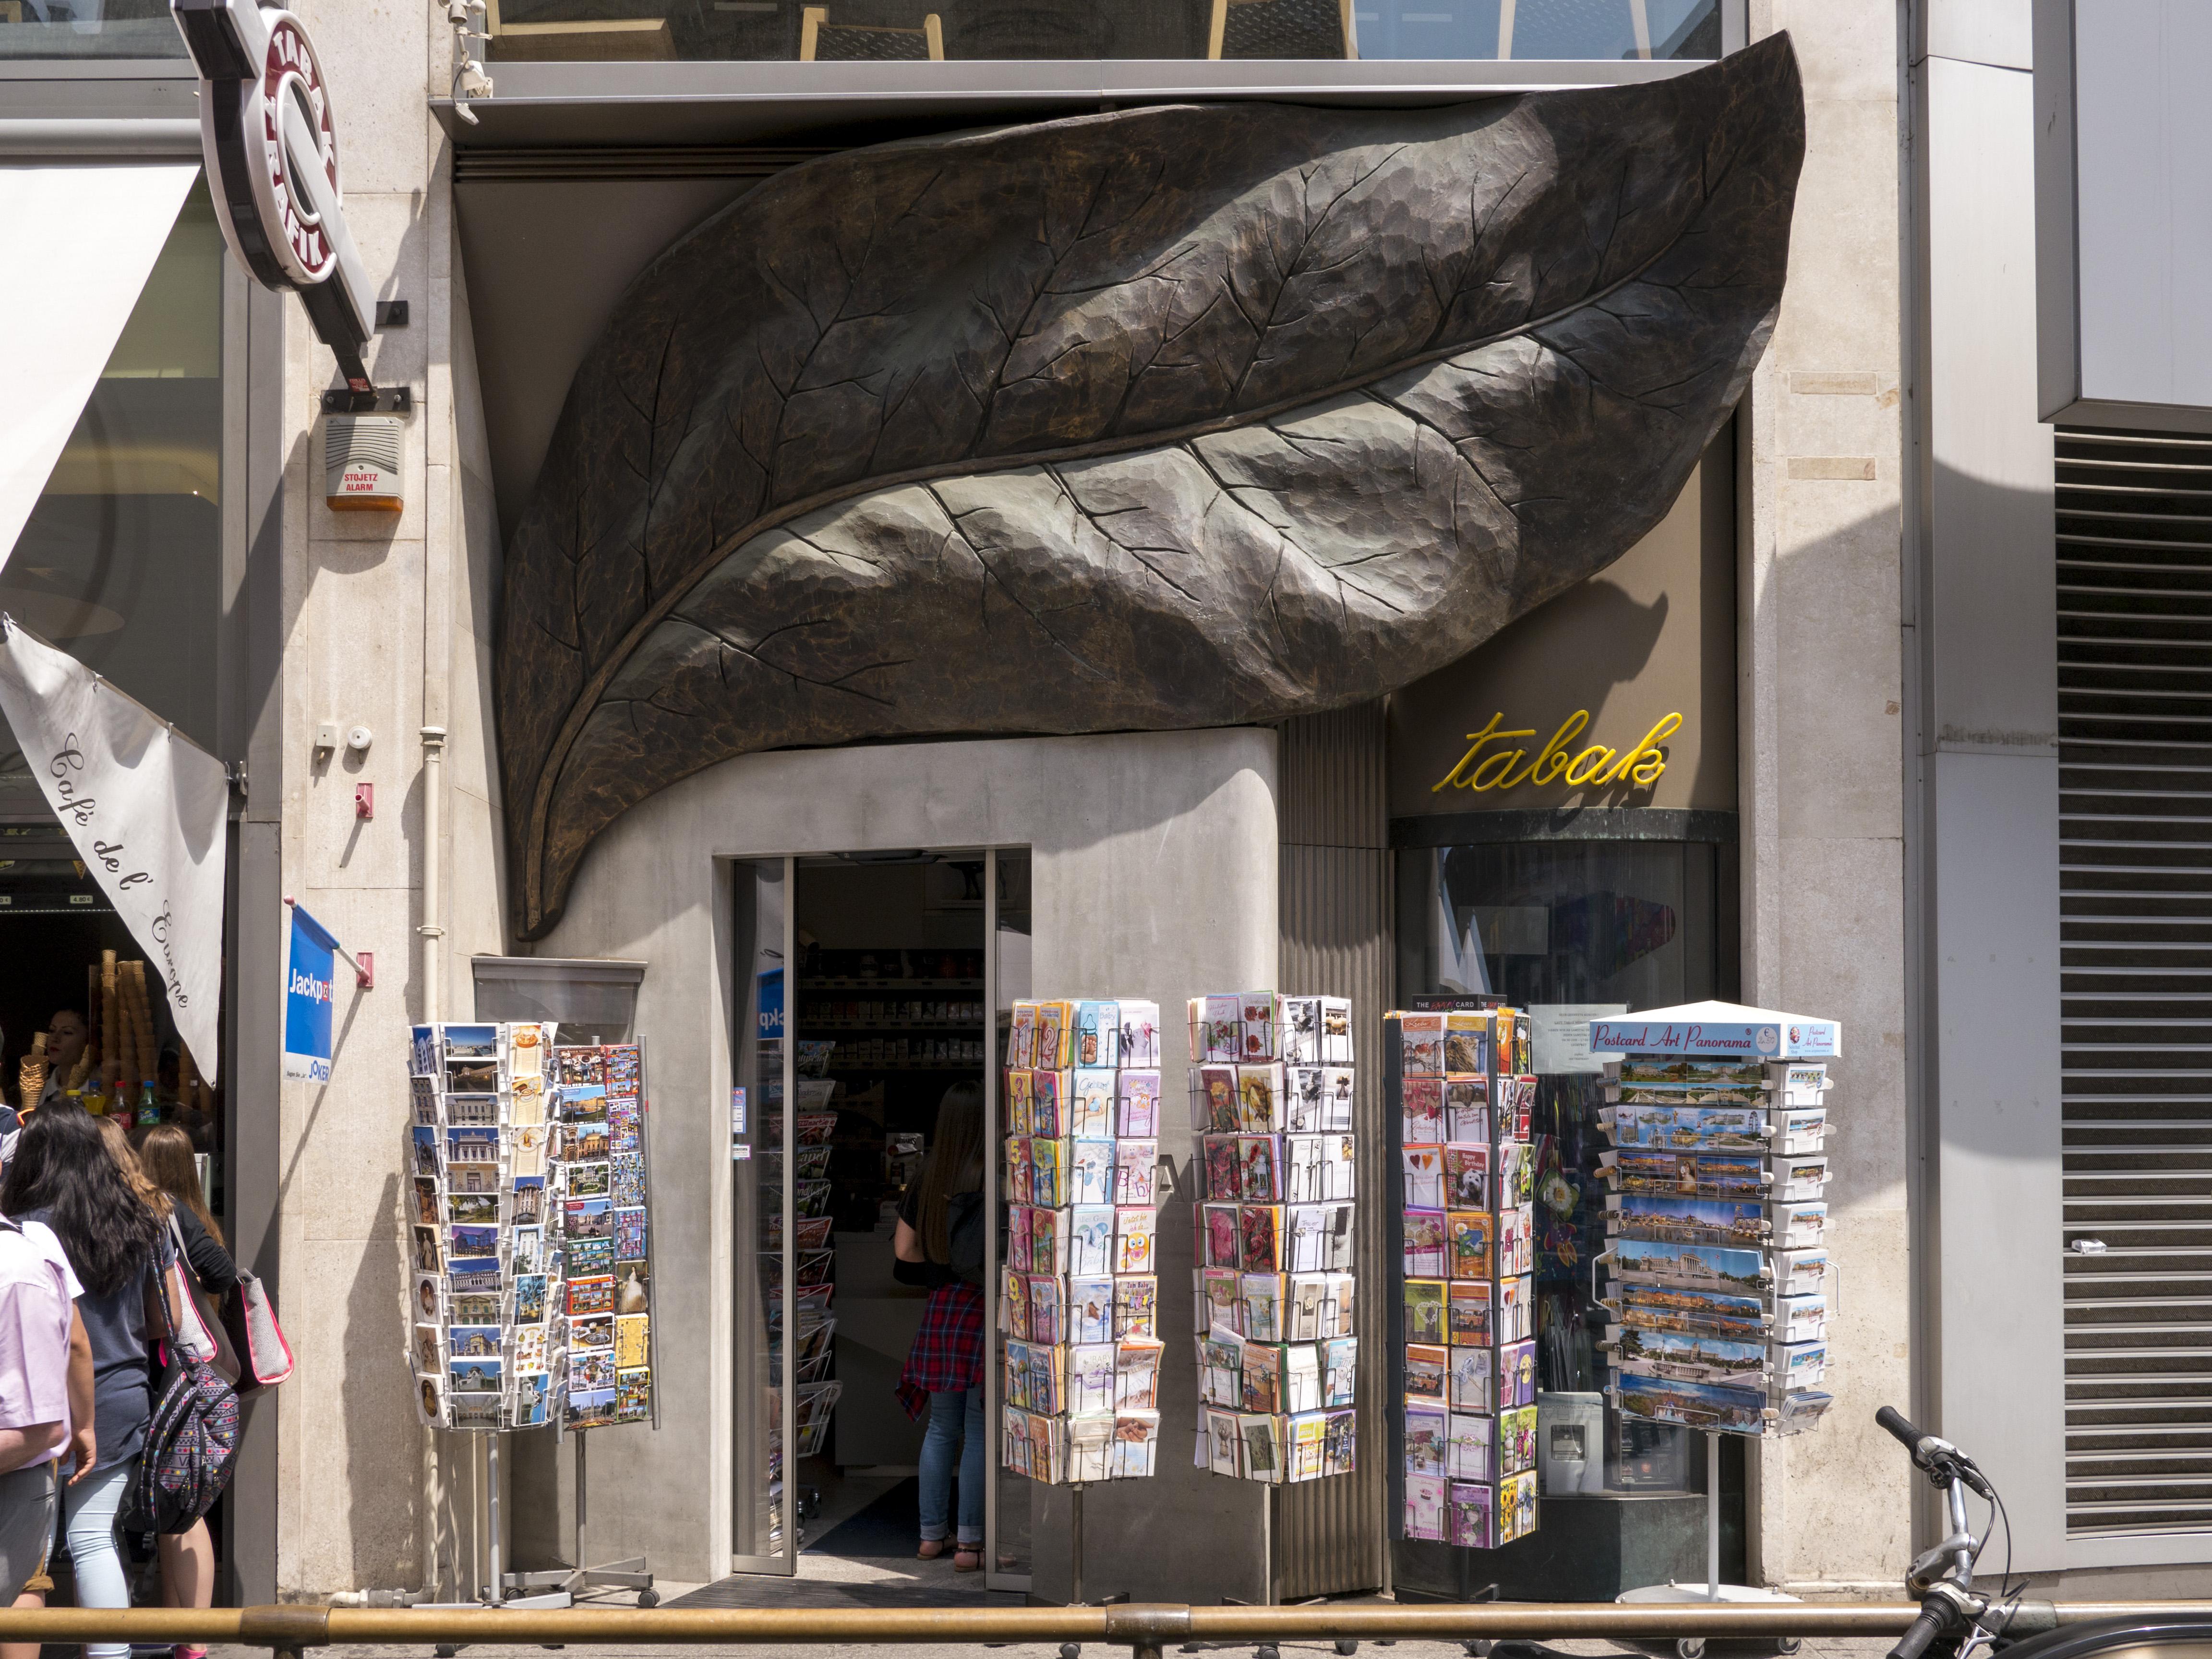 Strada novissima biennale venezia || Bowsneccatiro